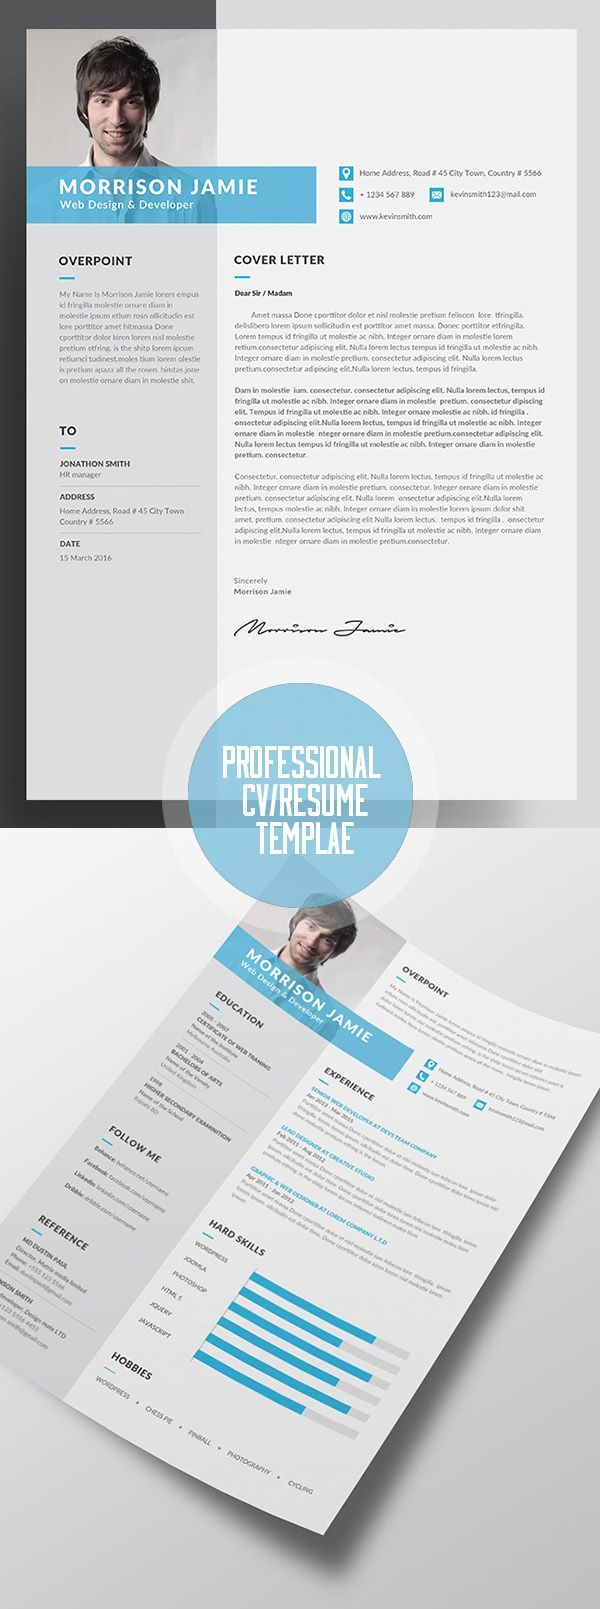 Professional Resume CV Template 100 best